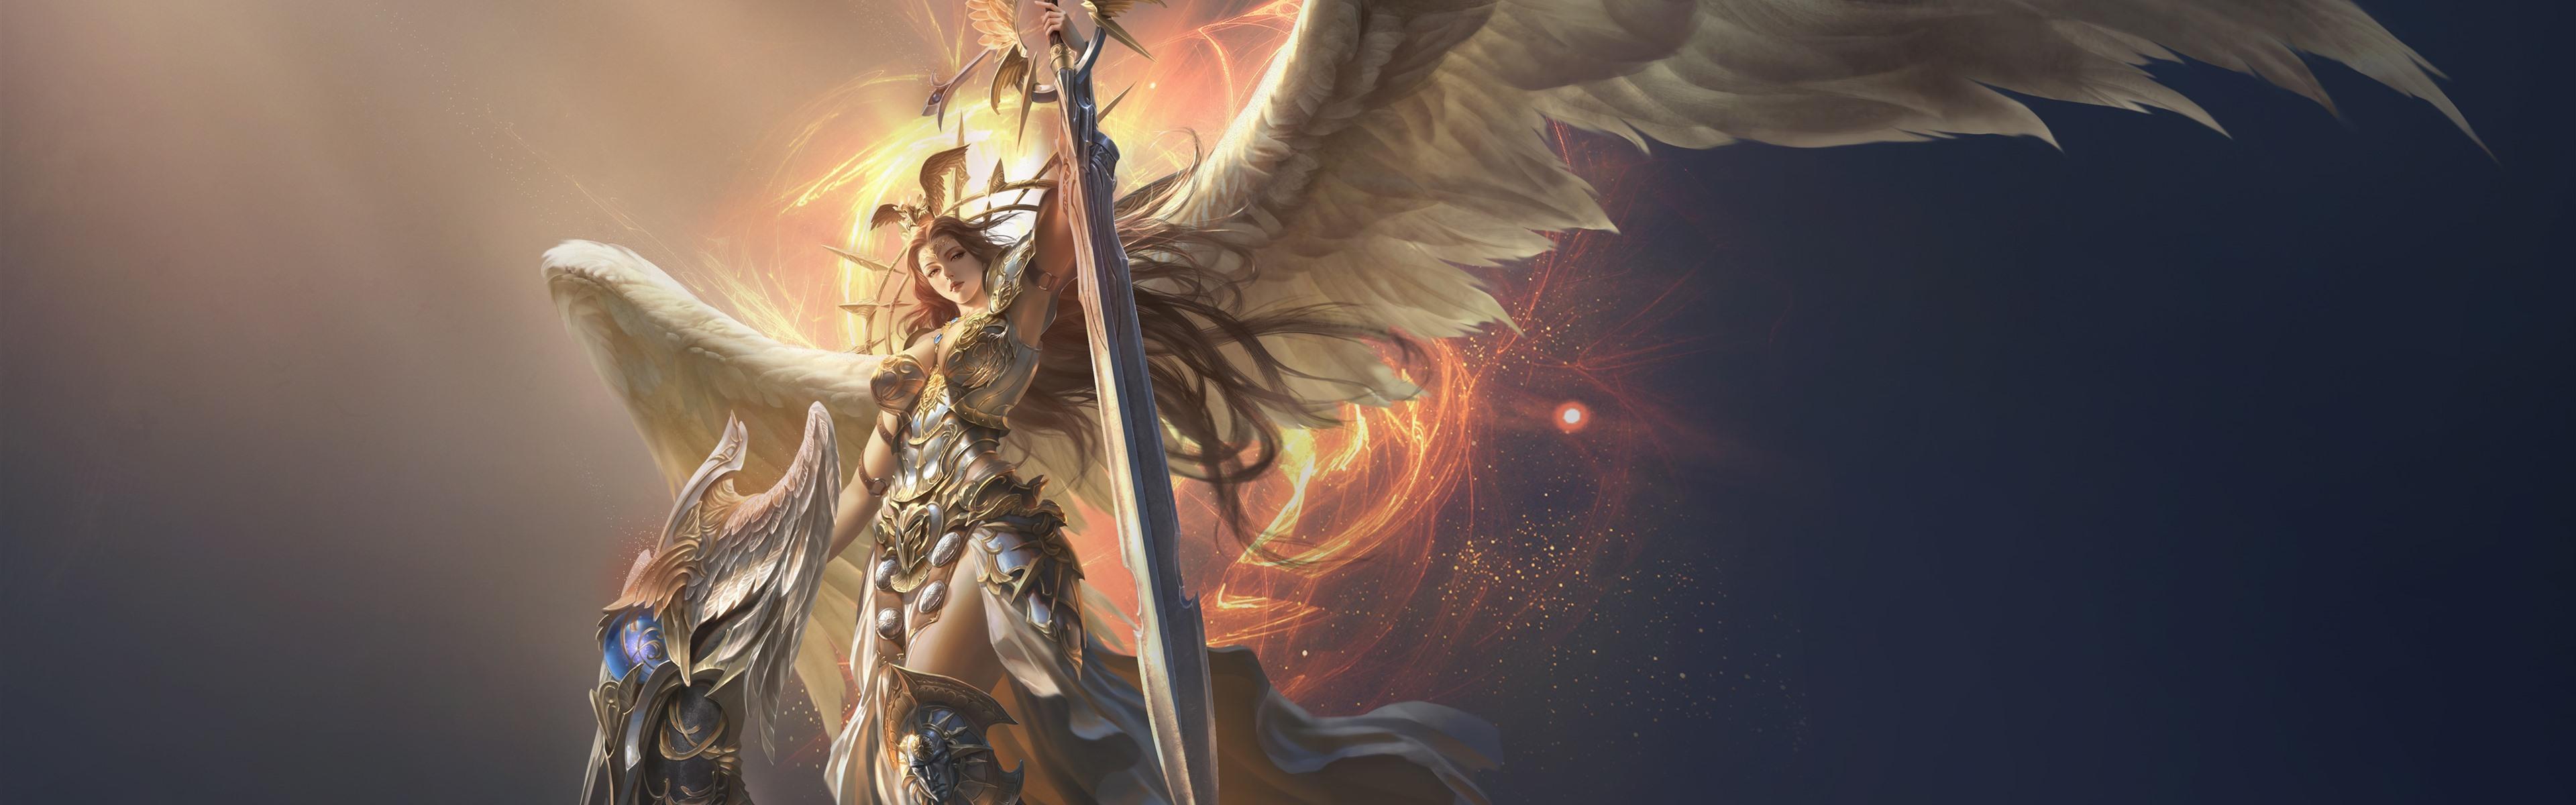 League Of Angels Beautiful Angel Wings Sword 1242x2688 Iphone